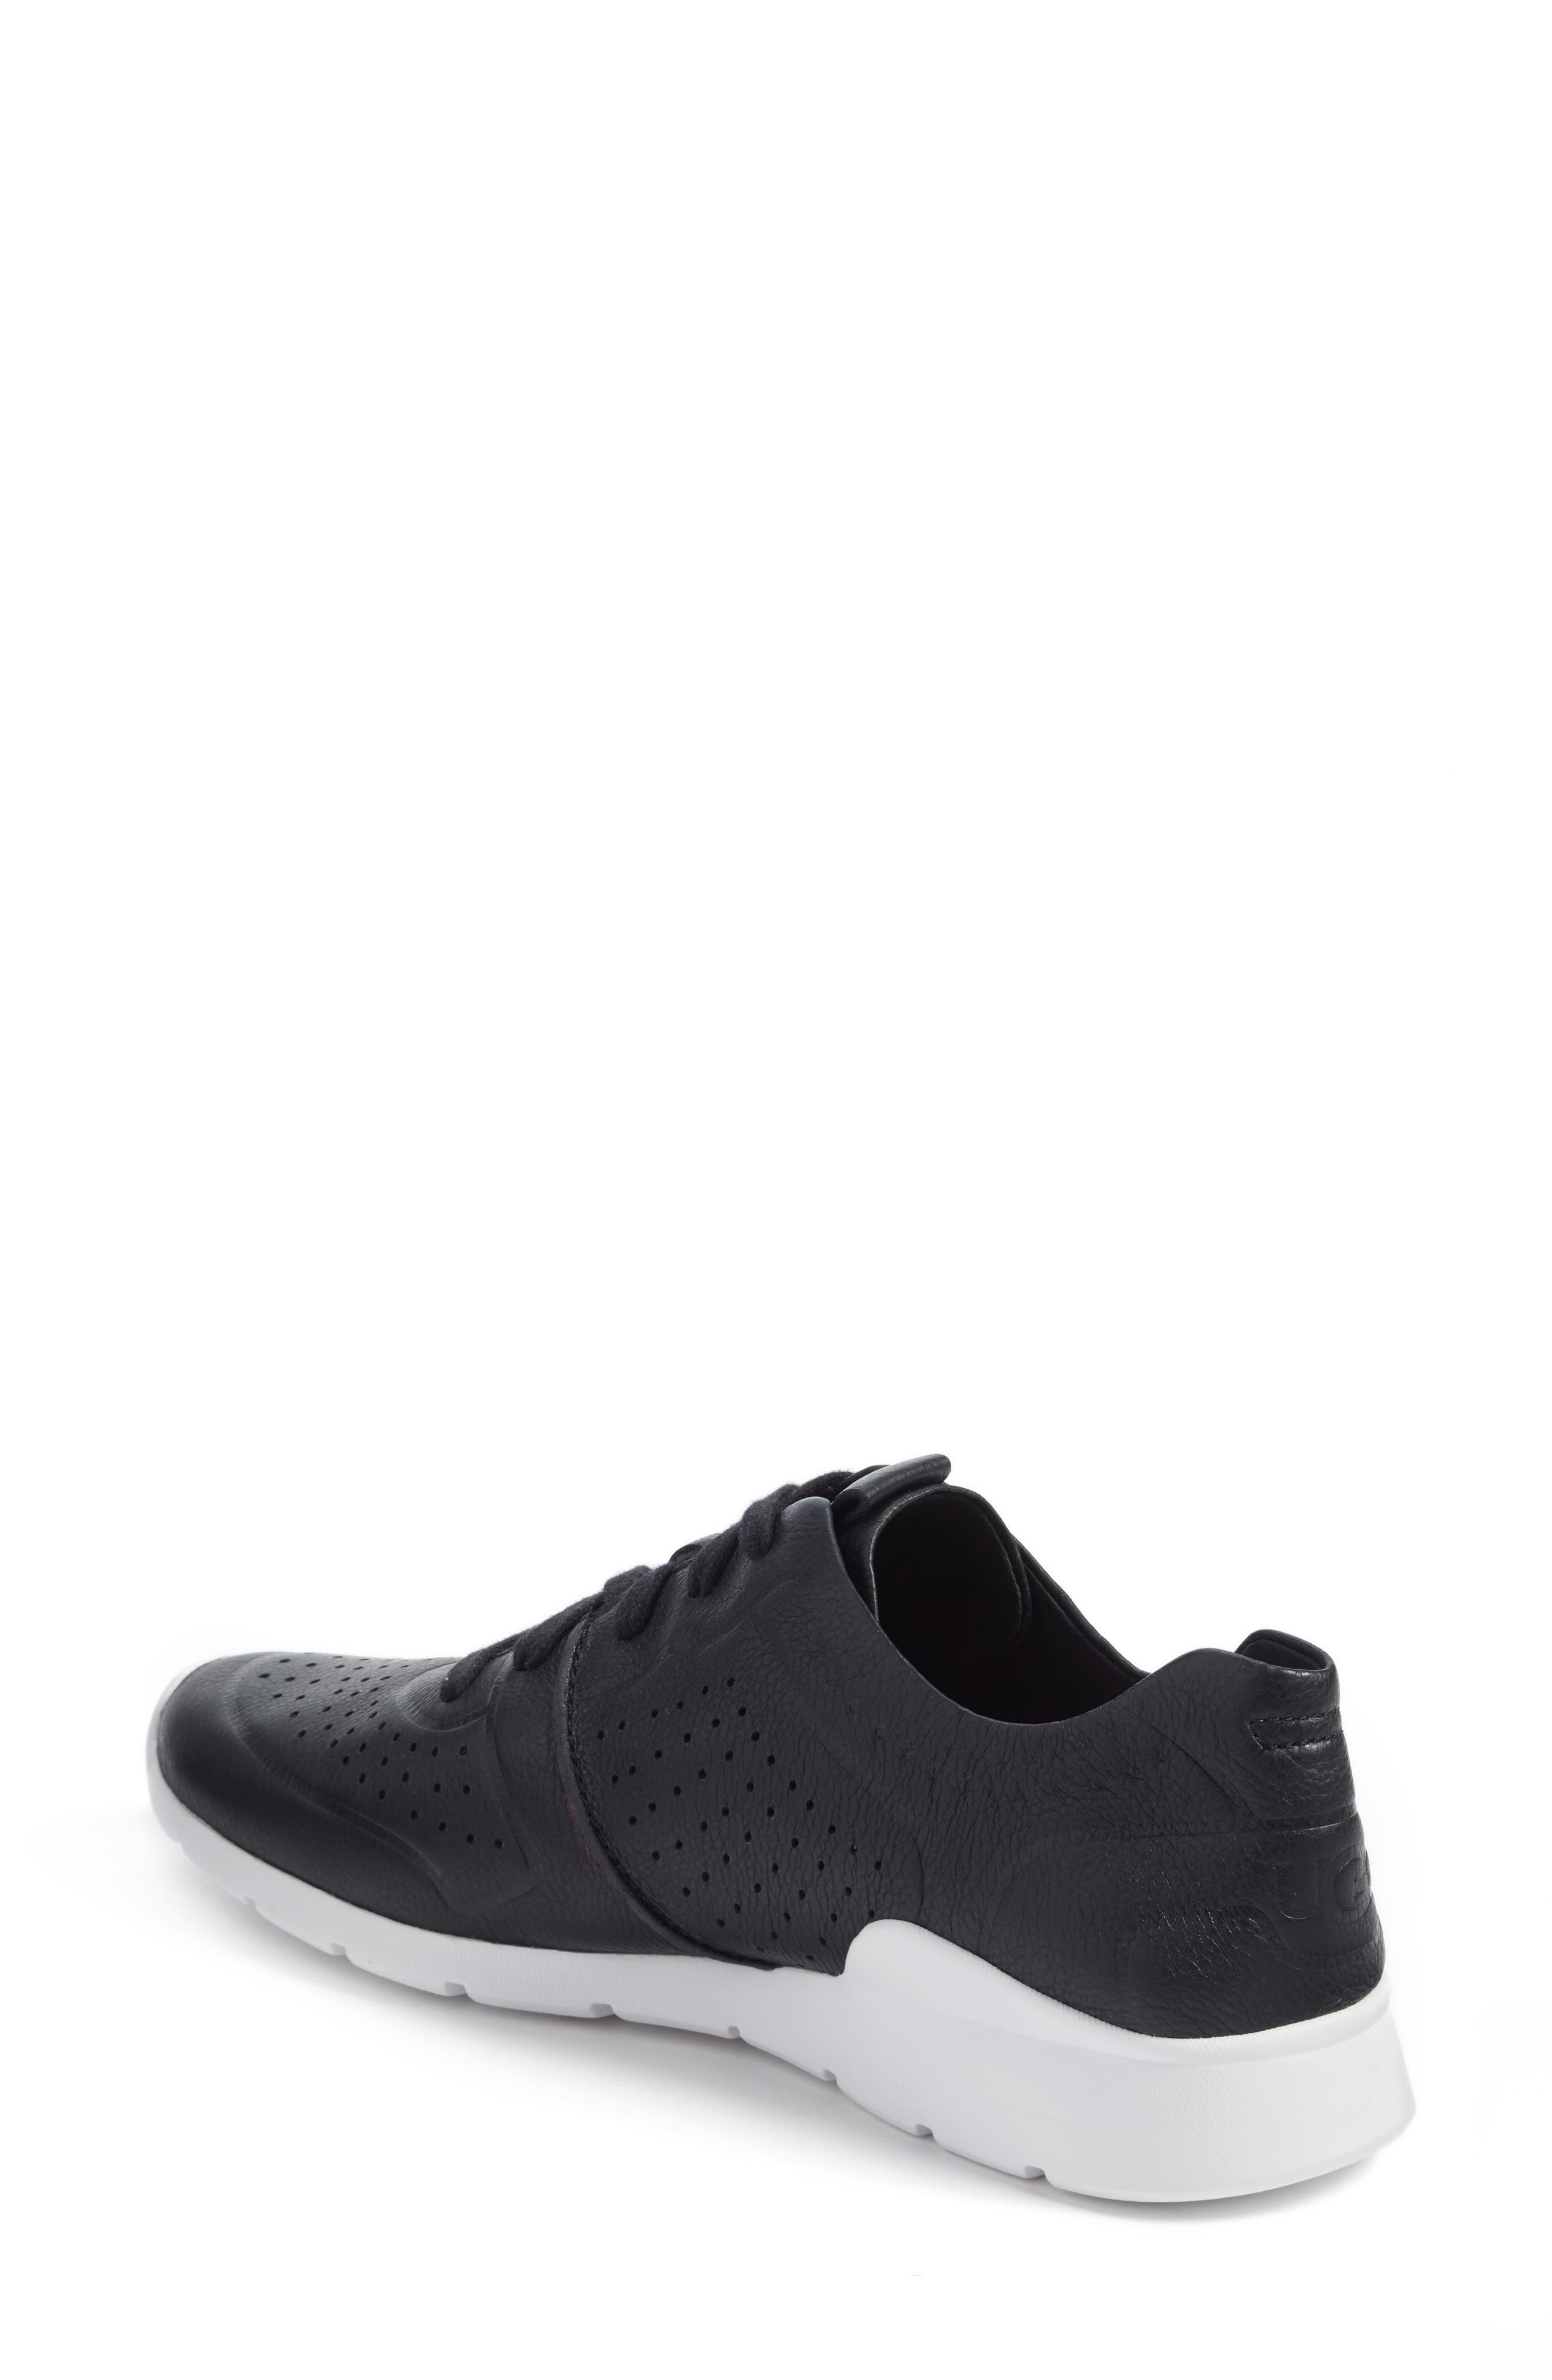 Tye Sneaker,                             Alternate thumbnail 2, color,                             001